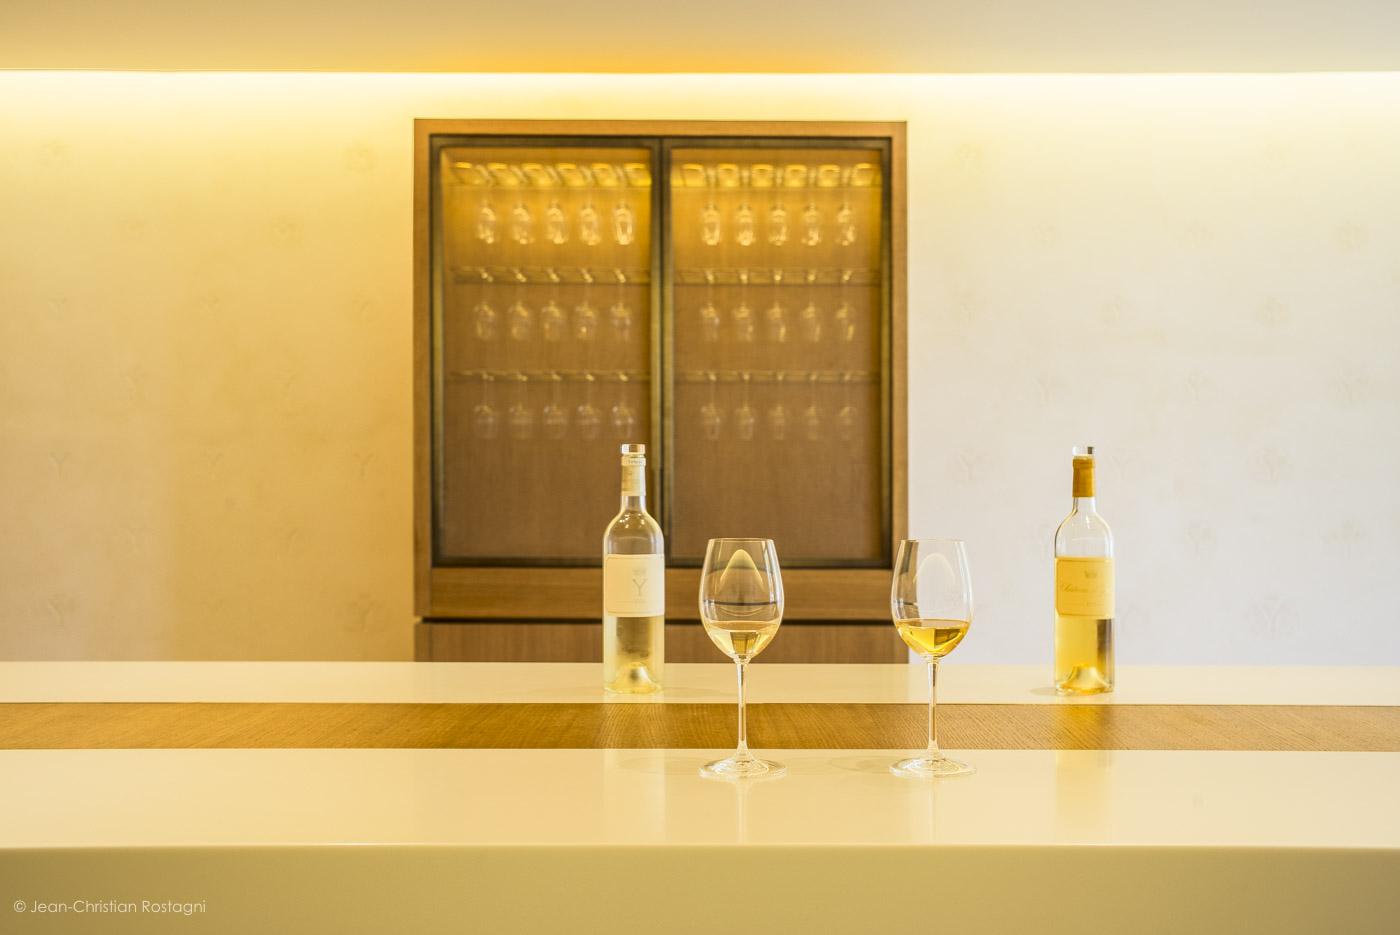 Chateau d'Yquem, wine tasting